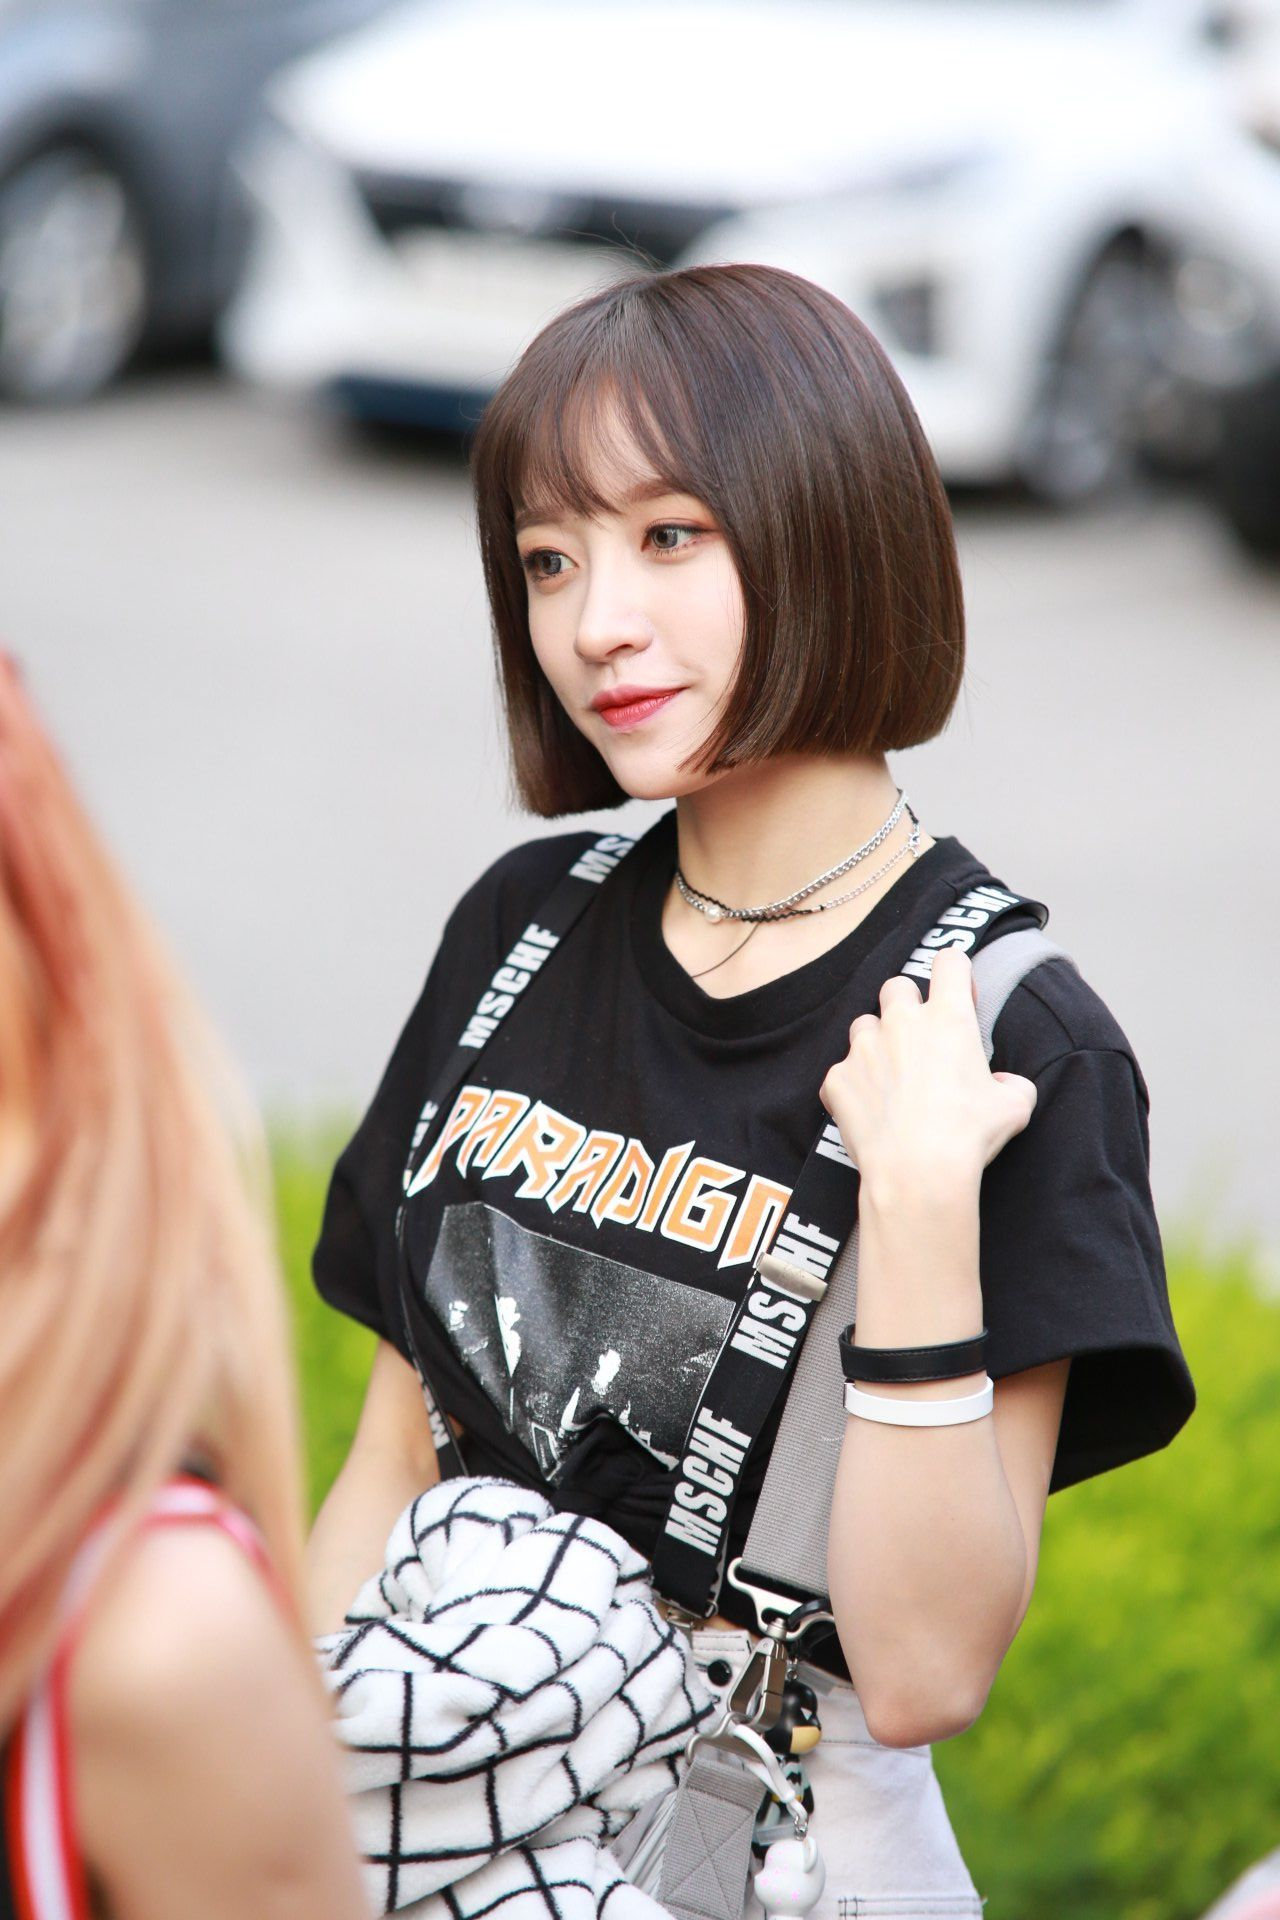 Koreans Claim These 2 Hairstyles Make Girls Look Innocent Koreaboo Kpop Short Hair Hani Short Hair Styles